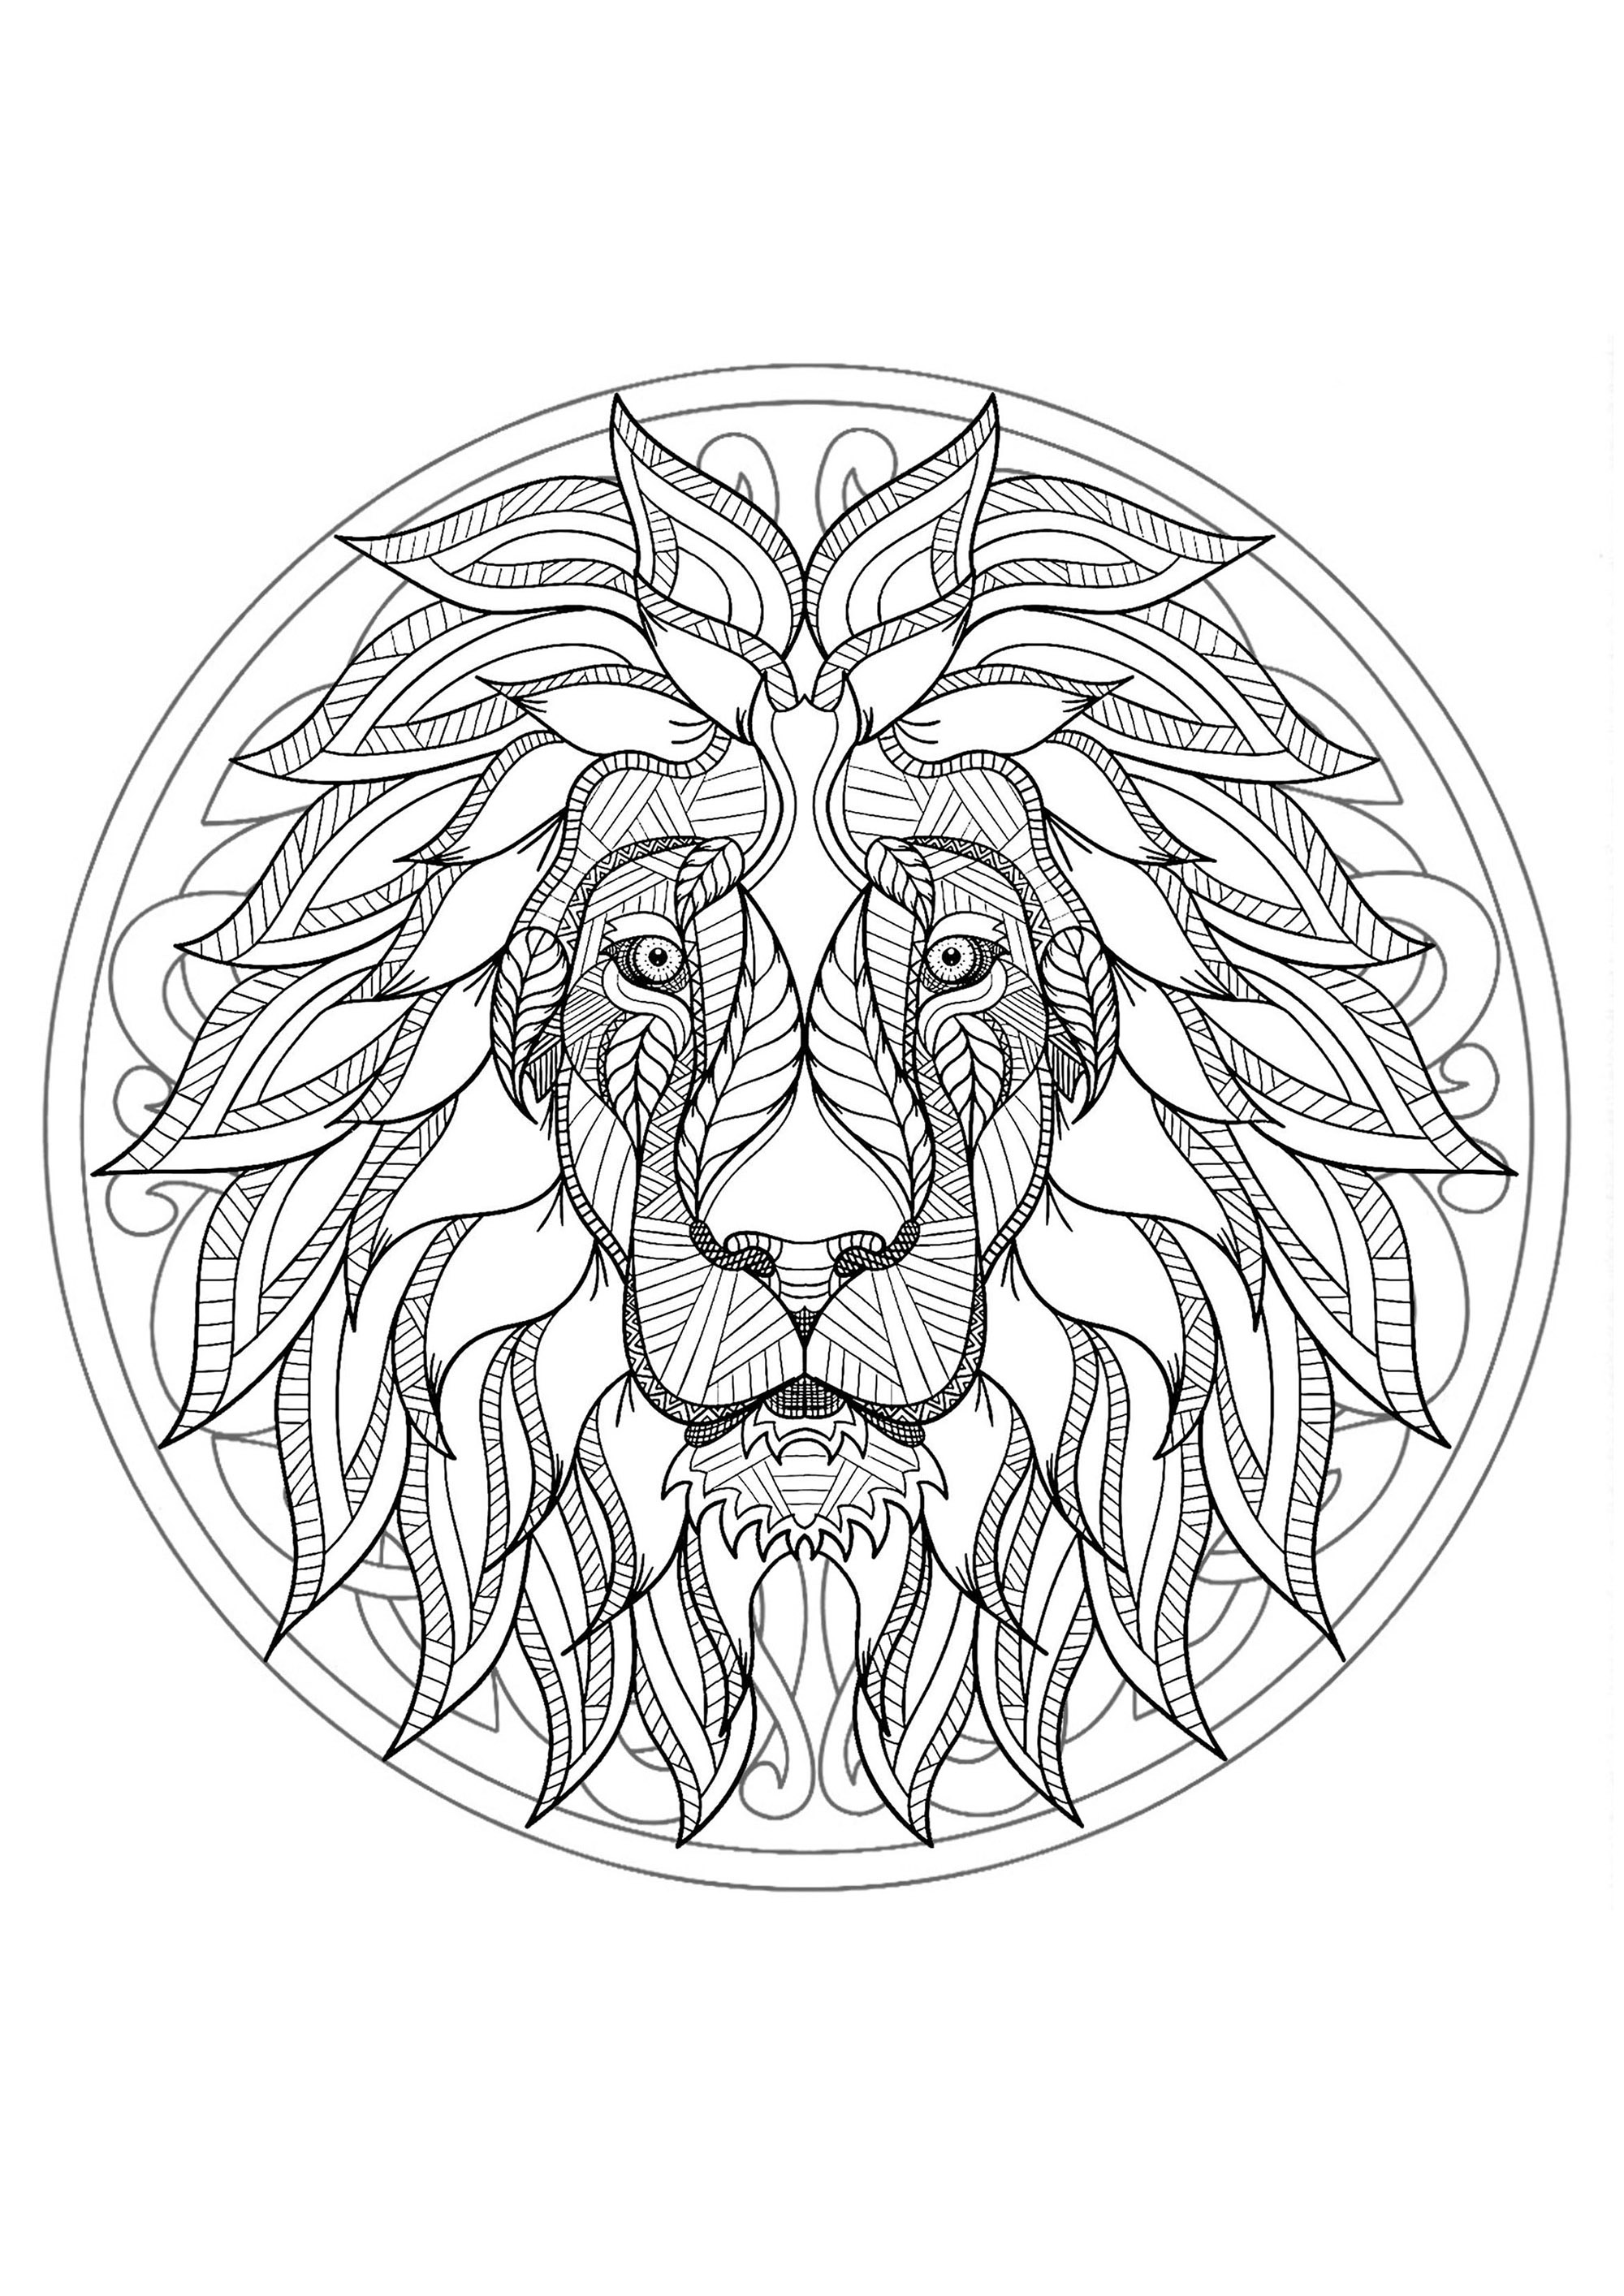 Harmonious Lion Head Mandala Mandalas With Animals 100